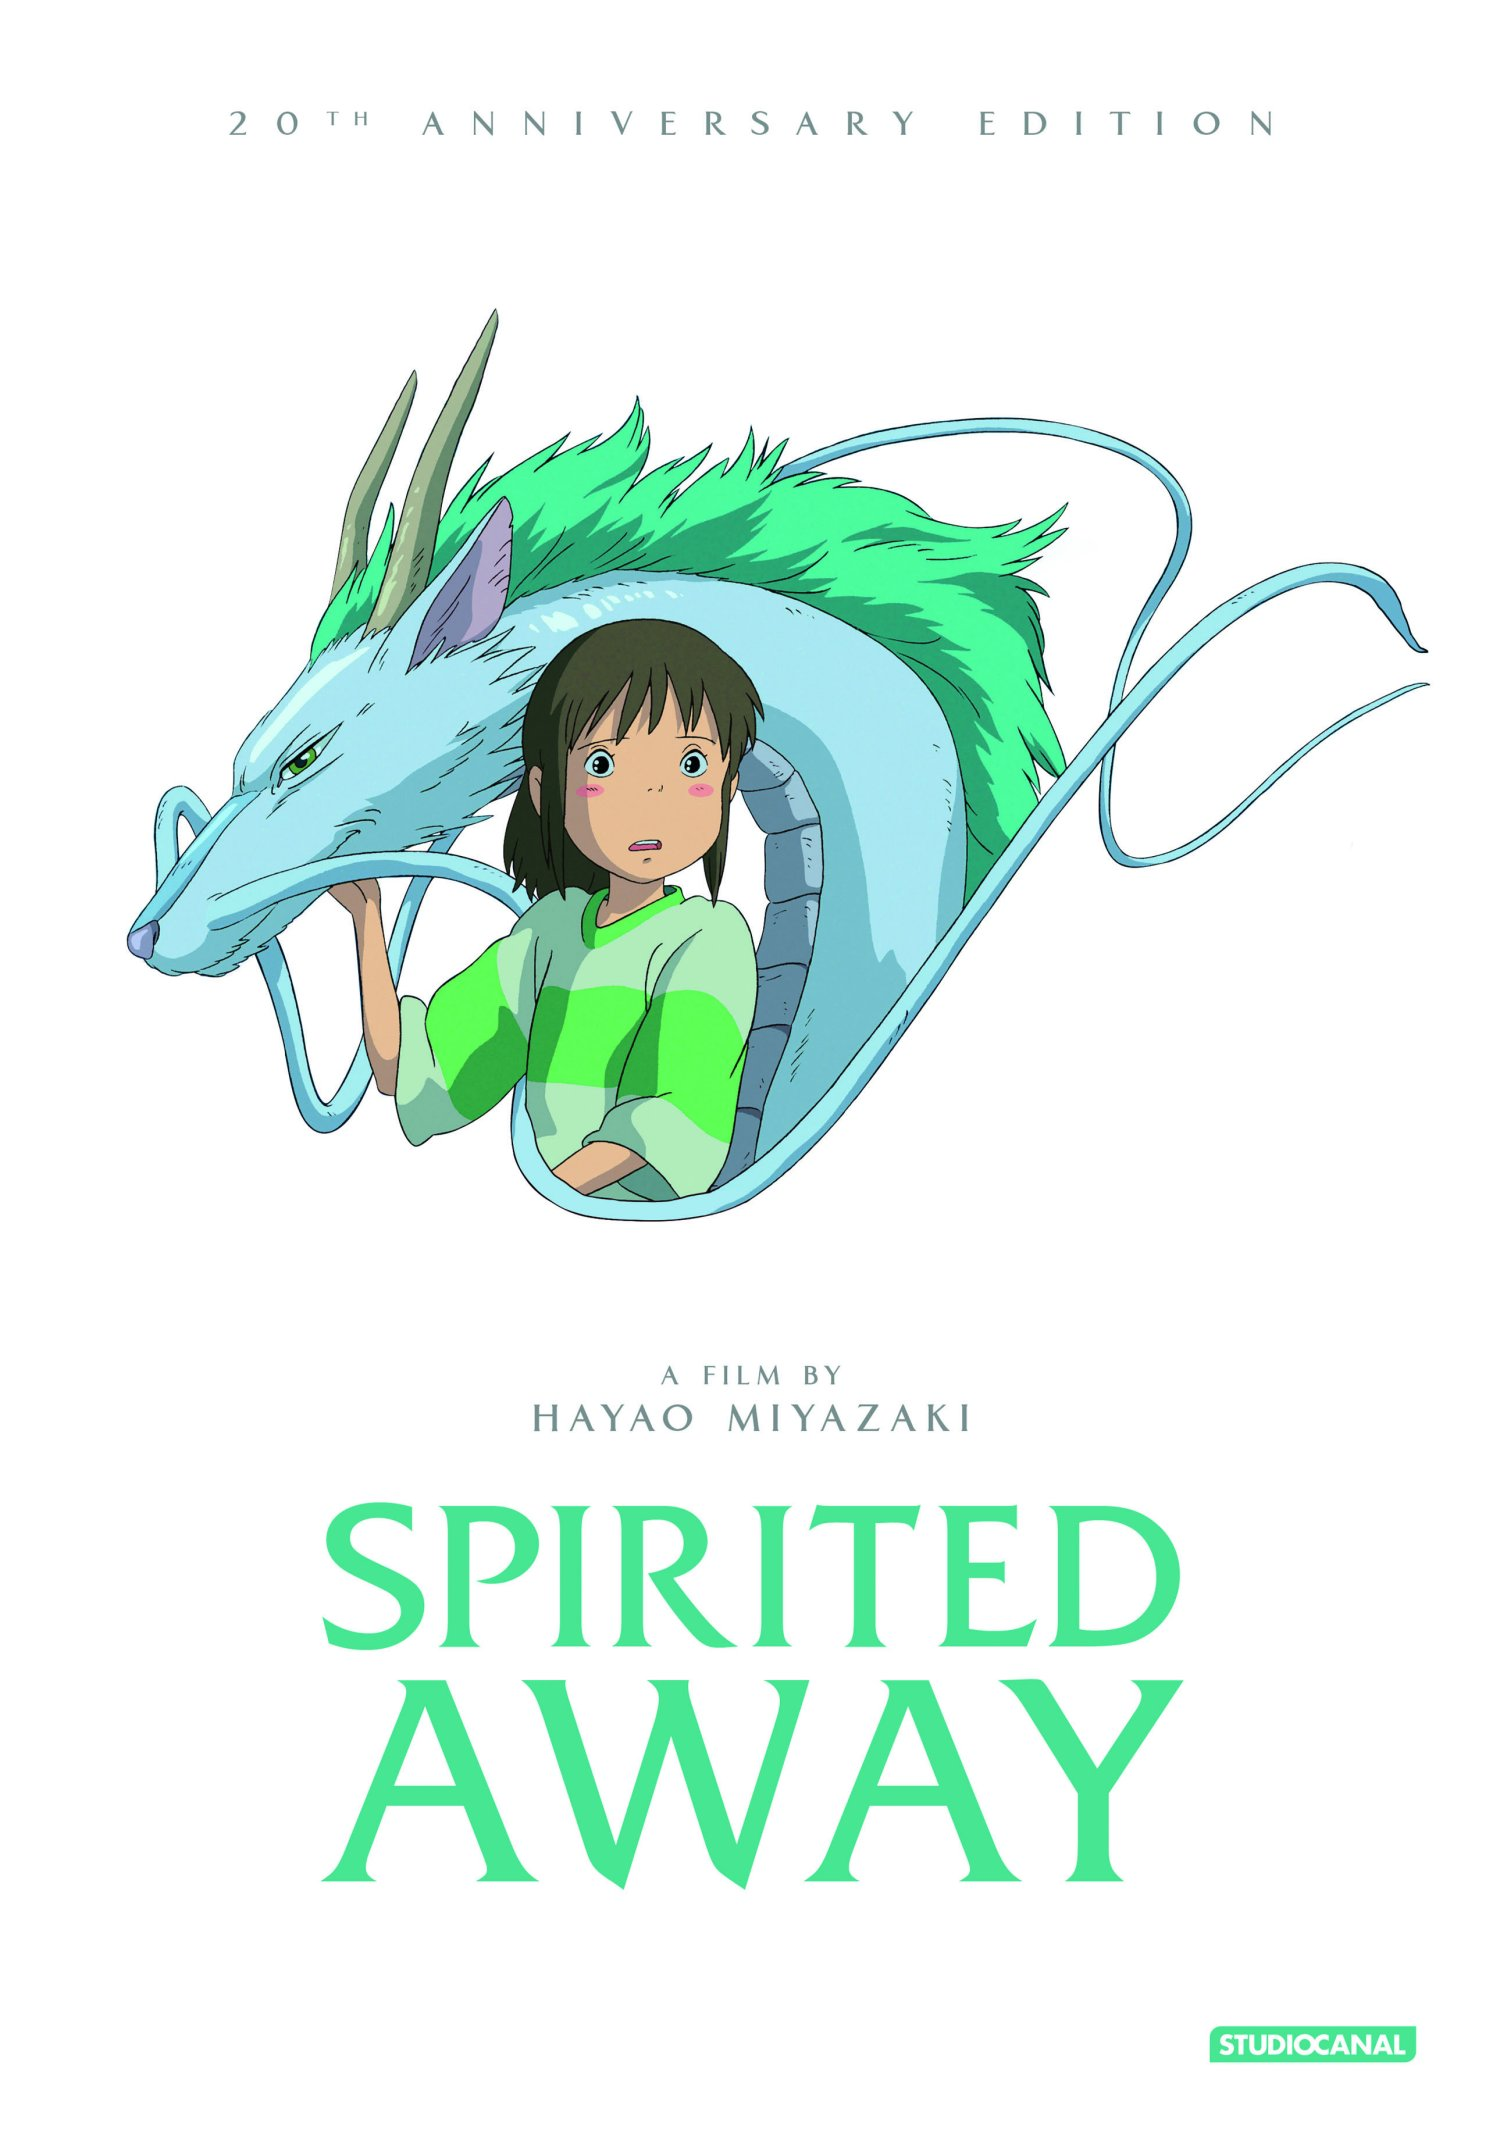 SpiritedAway_2D_Packshot